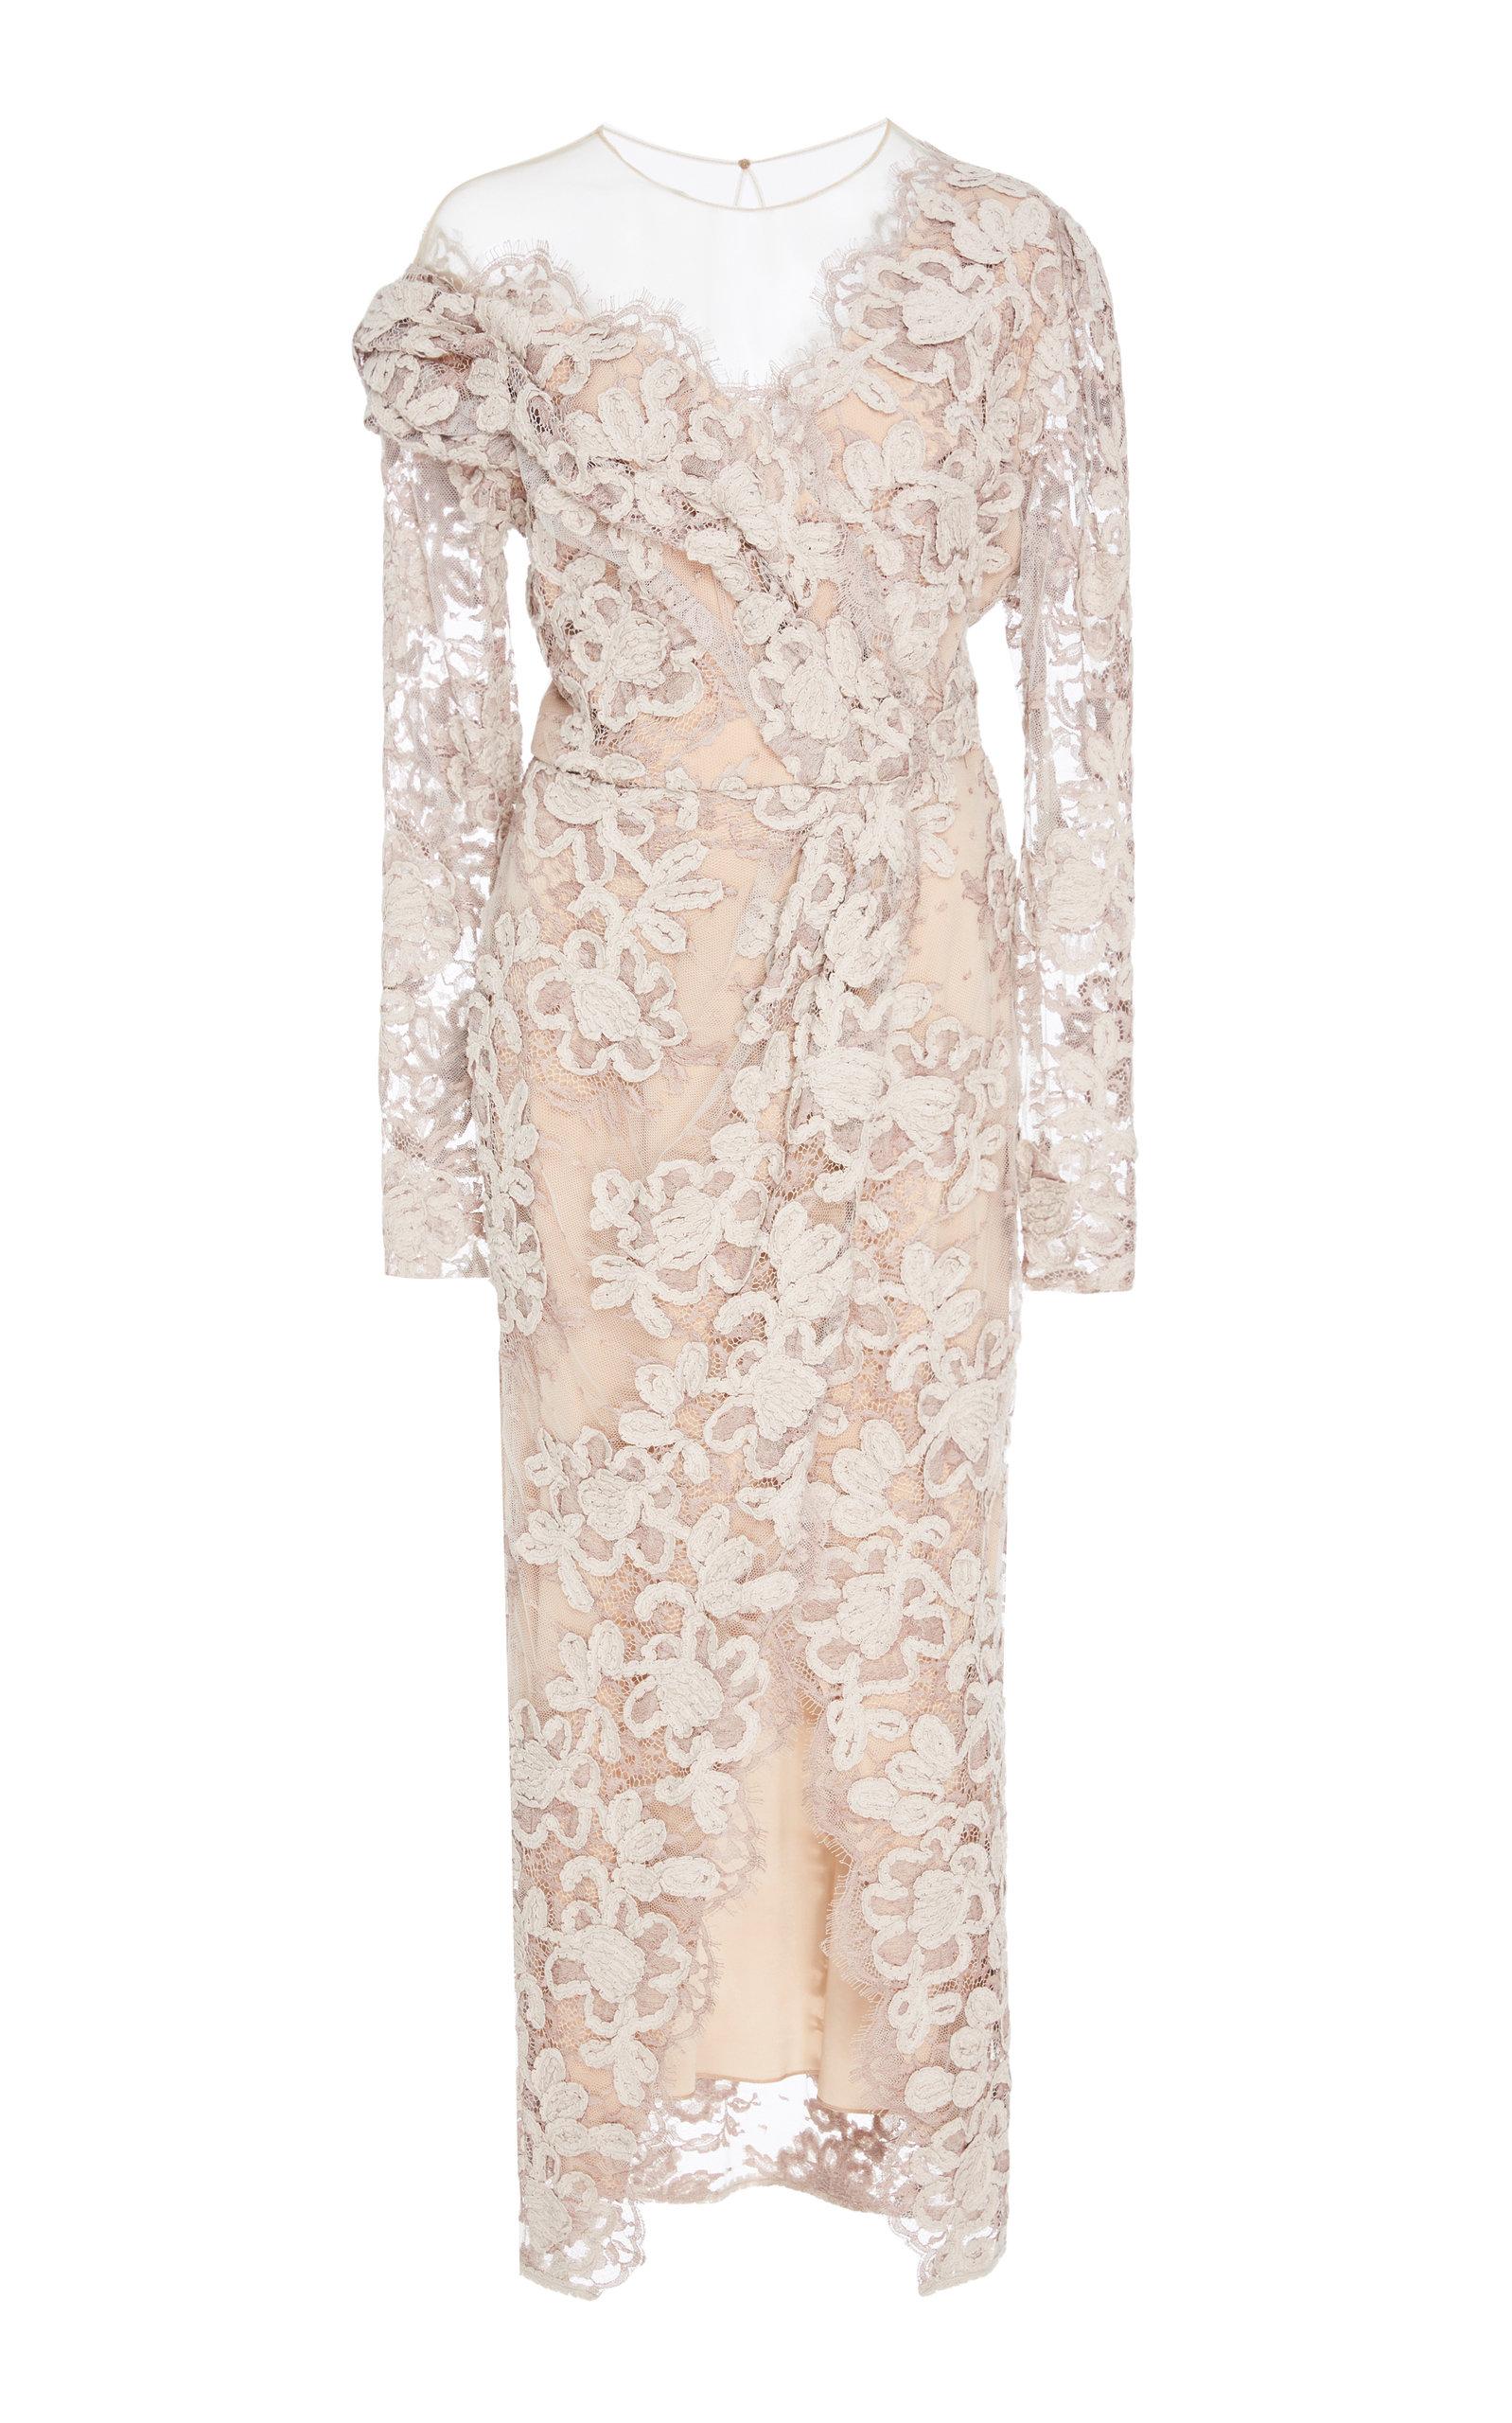 ALENA AKHMADULLINA Lace Midi Dress in Pink